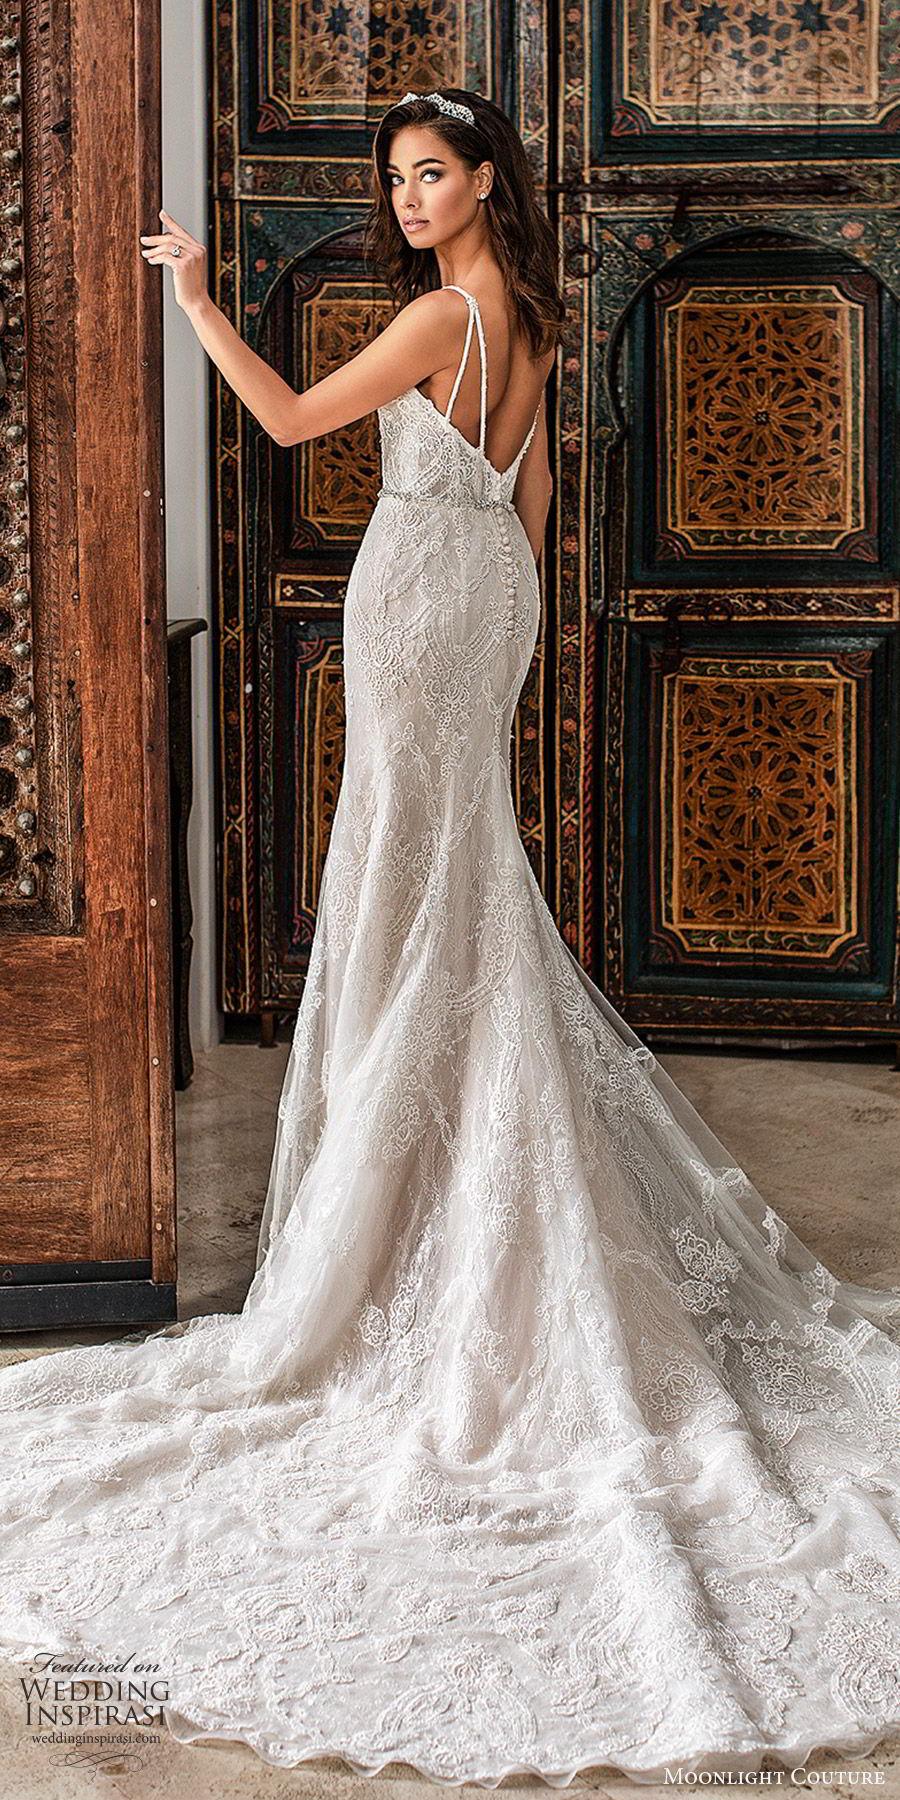 moonlight couture fall 2019 bridal sleeveless thin straps v neckling fully embellished lace sheath wedding dress (5) glam elegant sophisticated chapel train low back bv